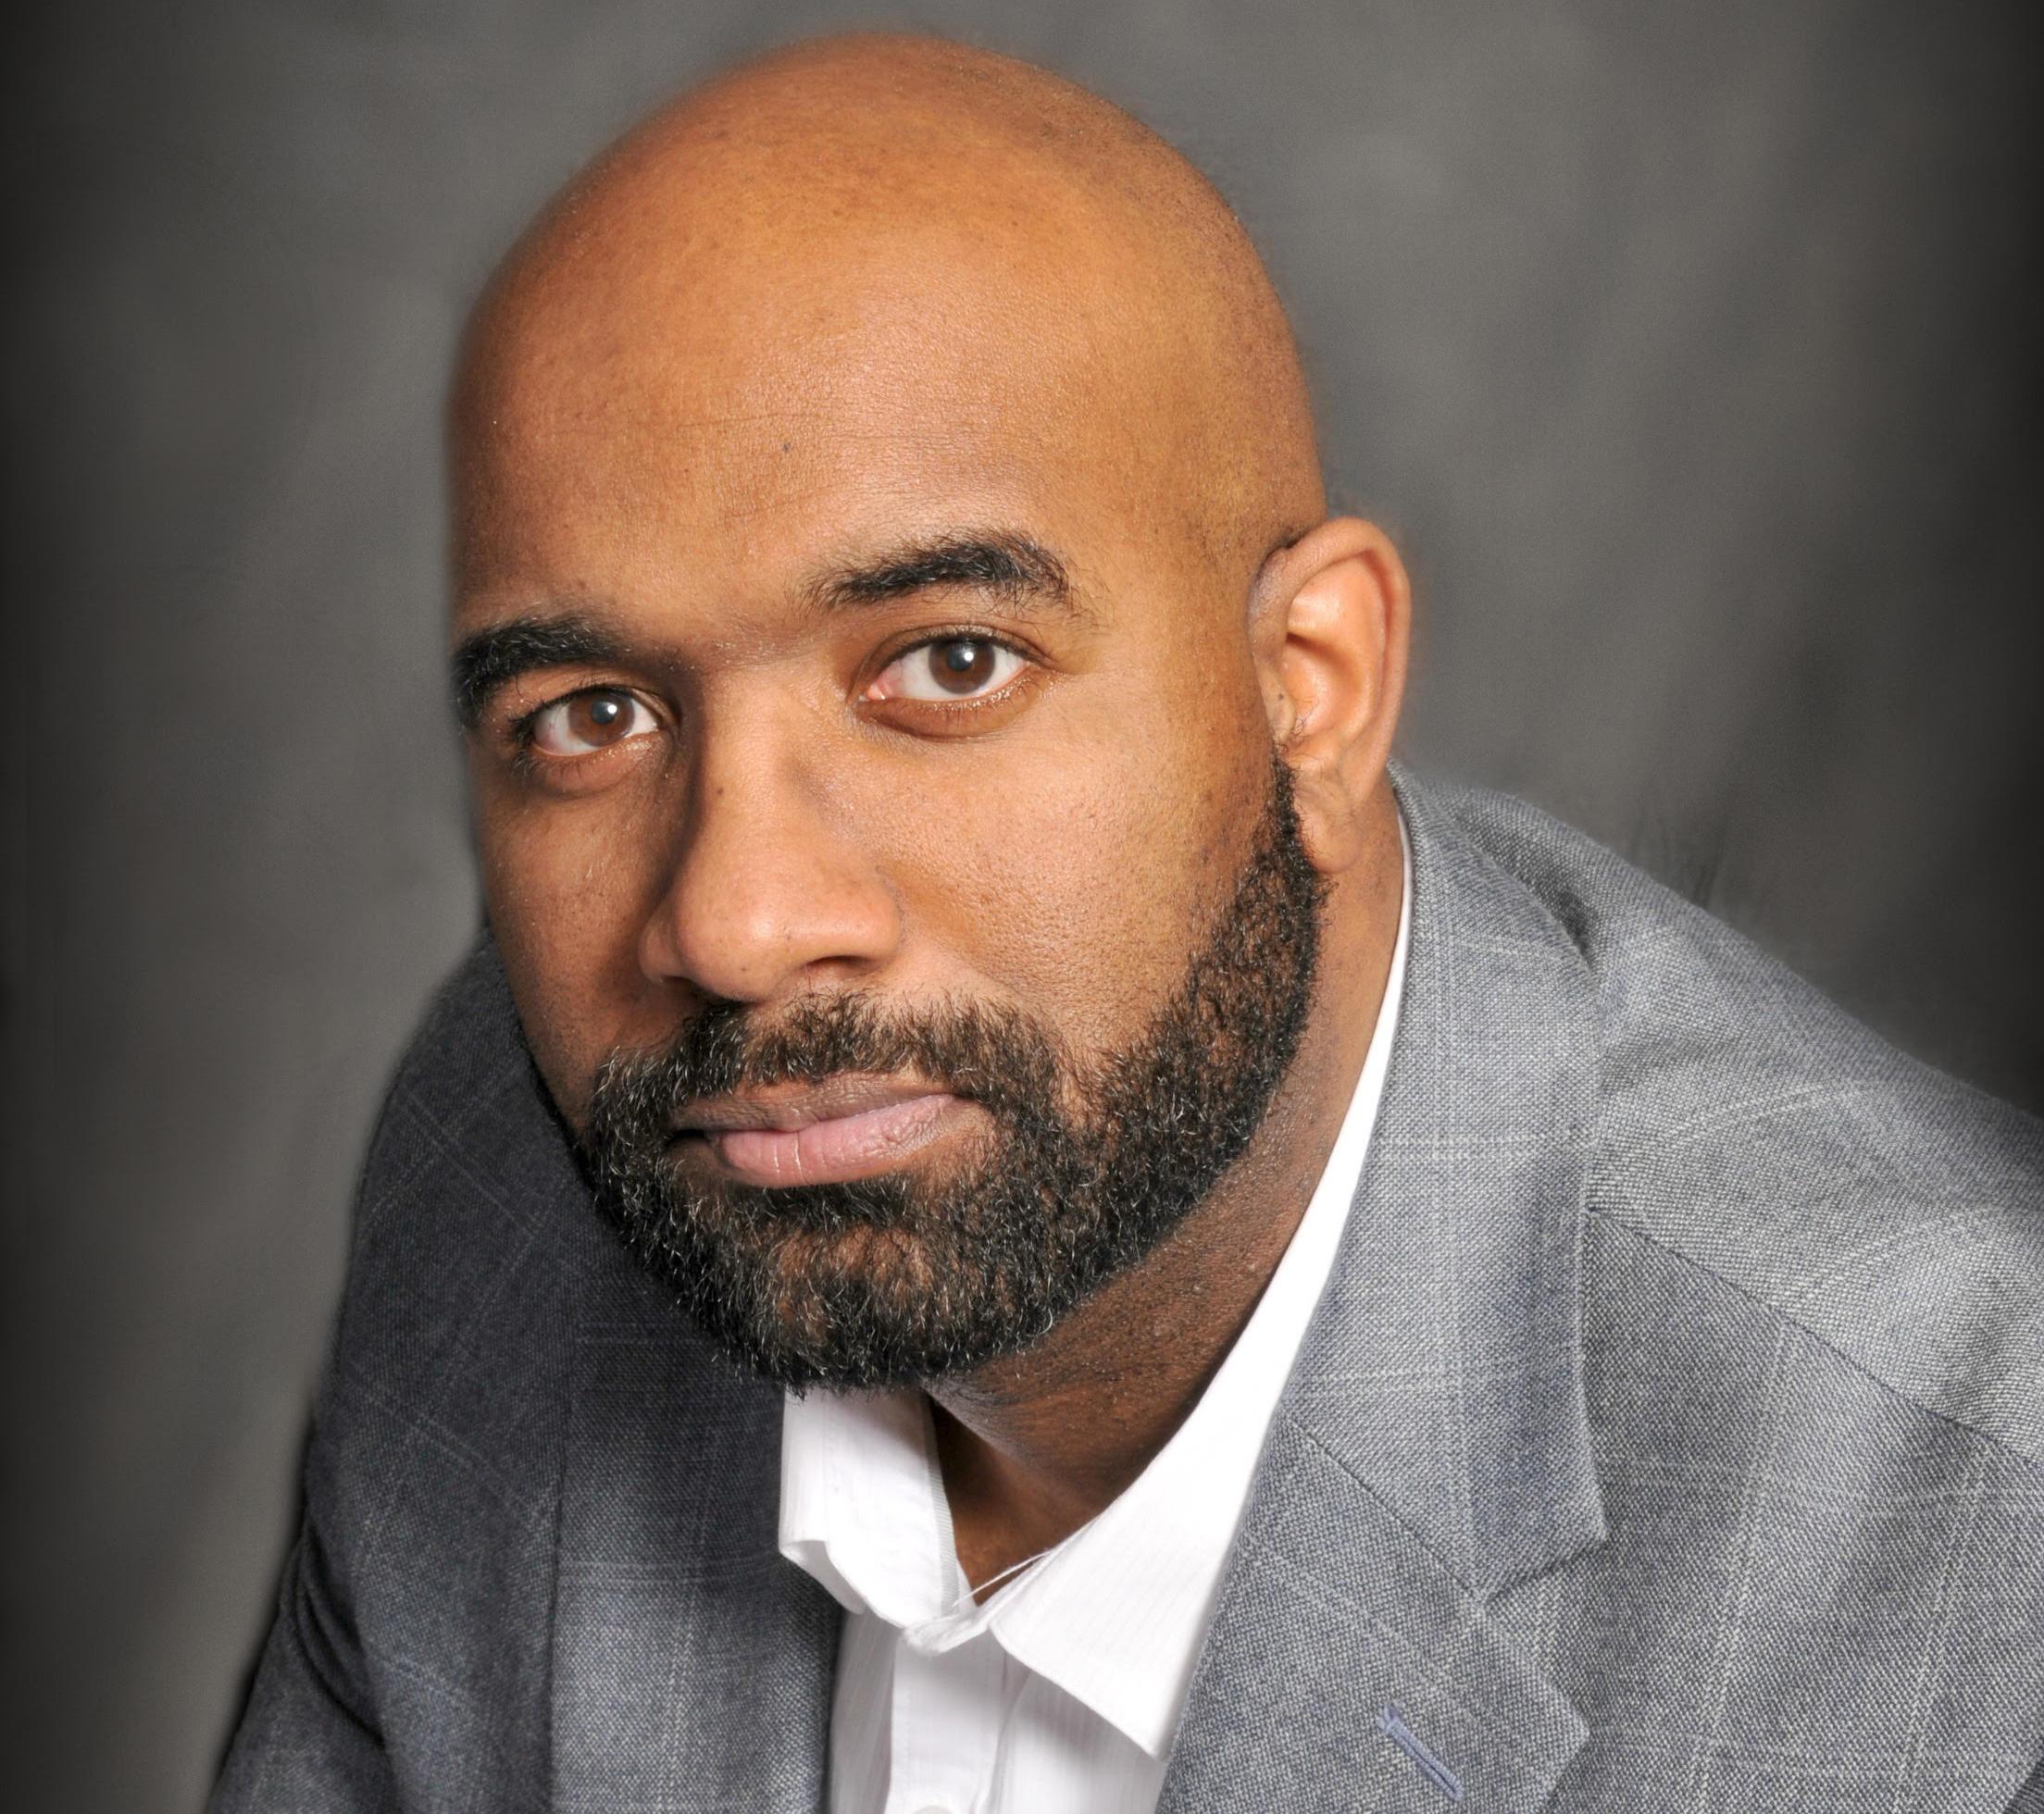 Quan Neloms is aggressively recruiting black men to teach in Detroit's public schools